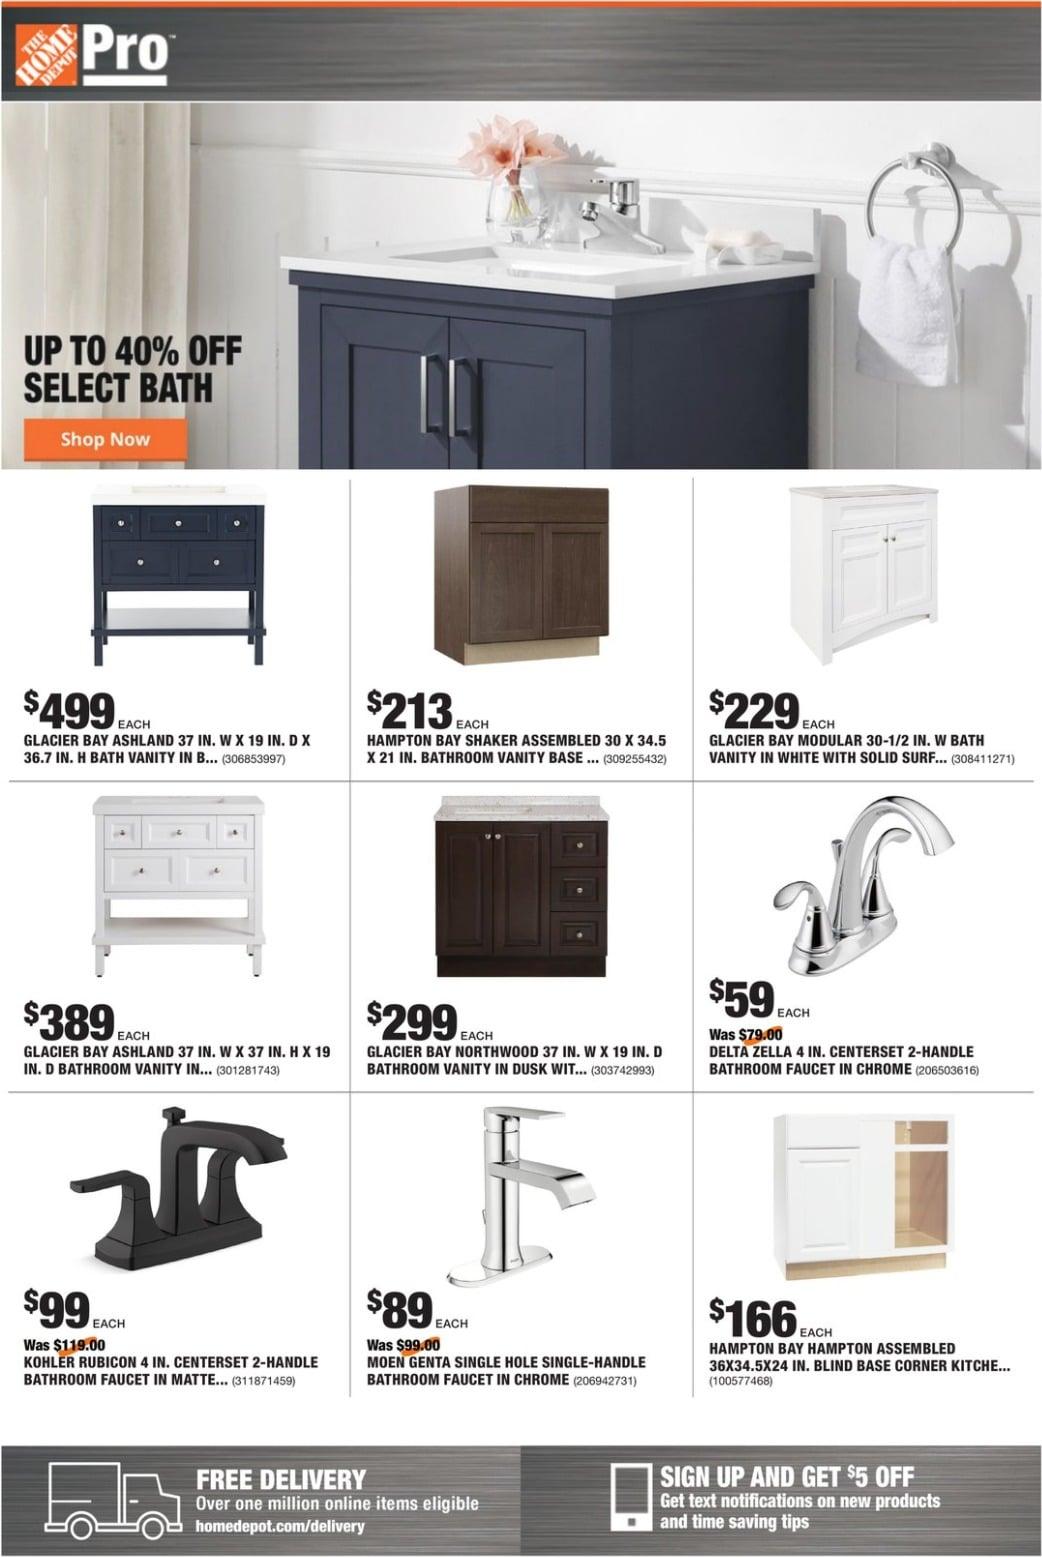 Home Depot Pro Ad January 11 - January 18, 2021